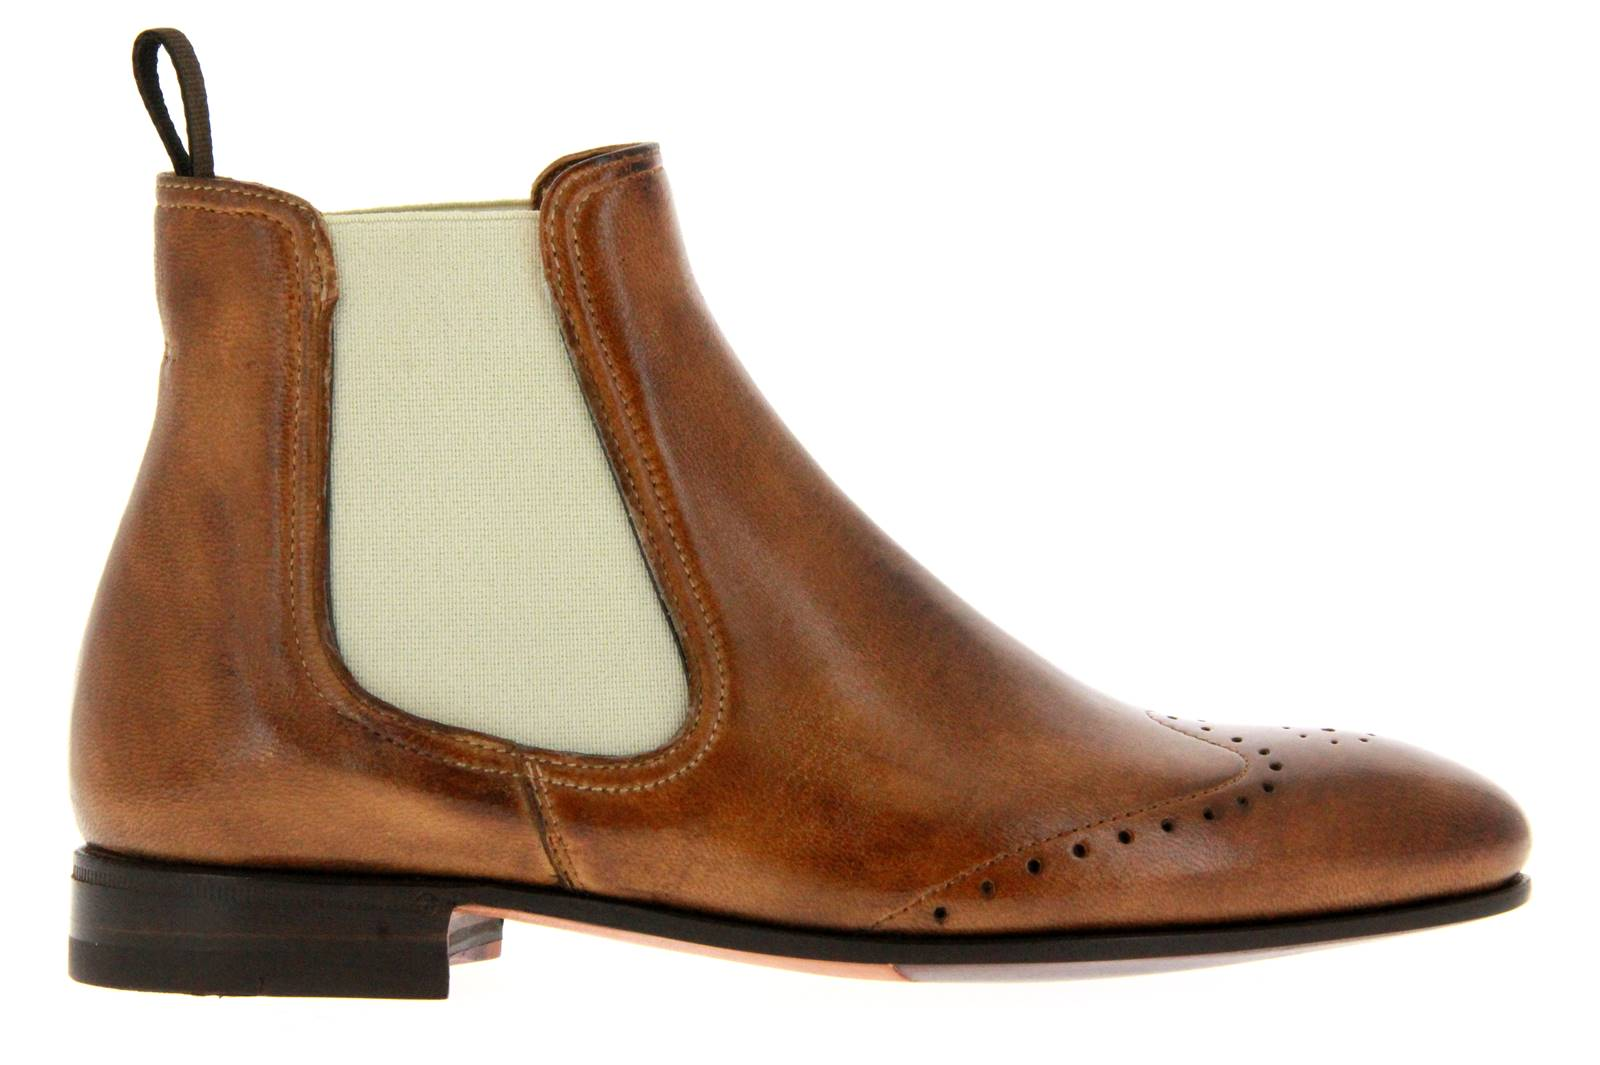 Benson's Chelsea boot CREVO CAMEL